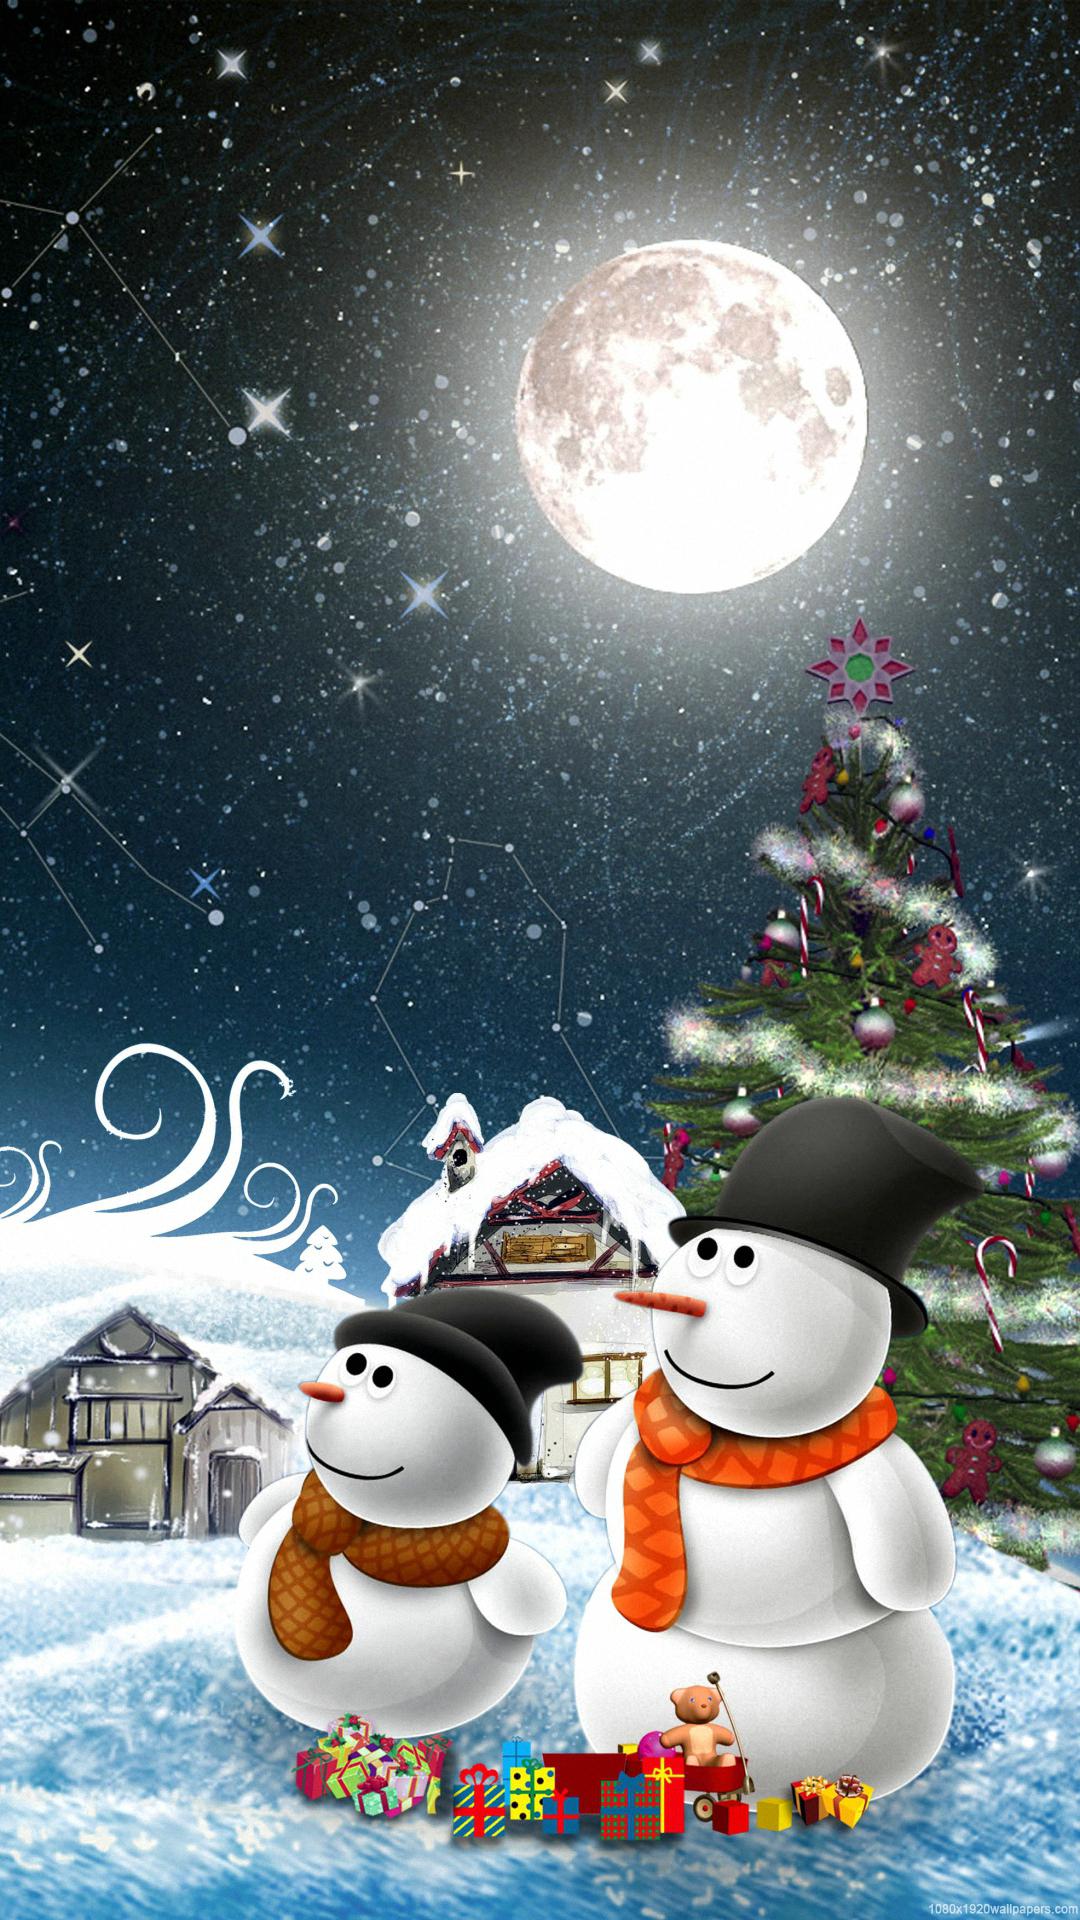 iphone christmas wallpaper hd